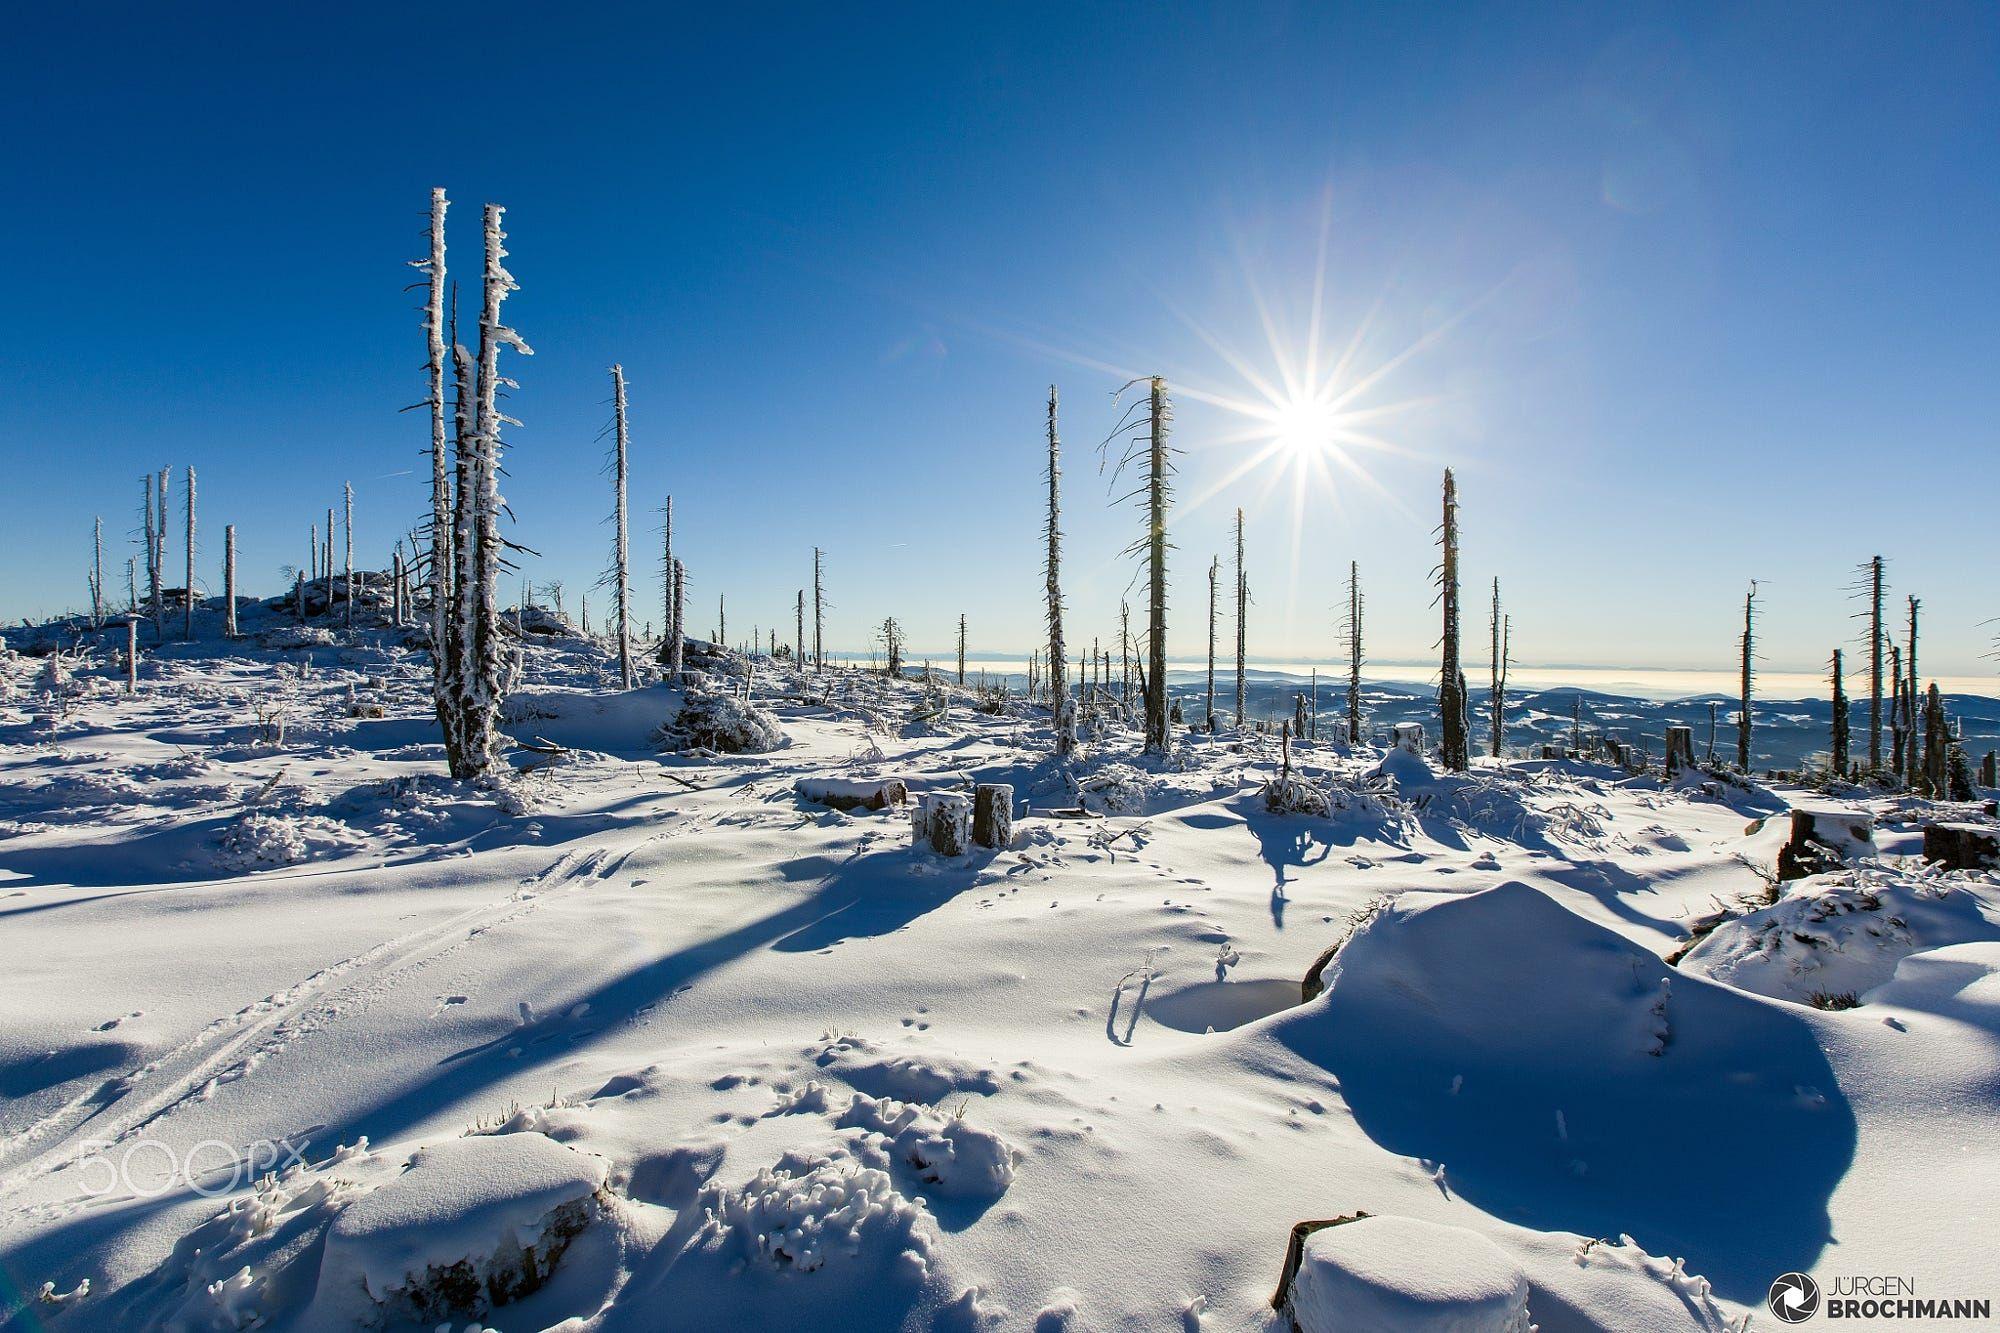 #Photography #500px Winter am Plöckenstein by jbrochmann https://t.co/Yr56PYDekQ #IFTTT #Nature #HappyHolidays https://t.co/Ip23CC5BLG #f #photography